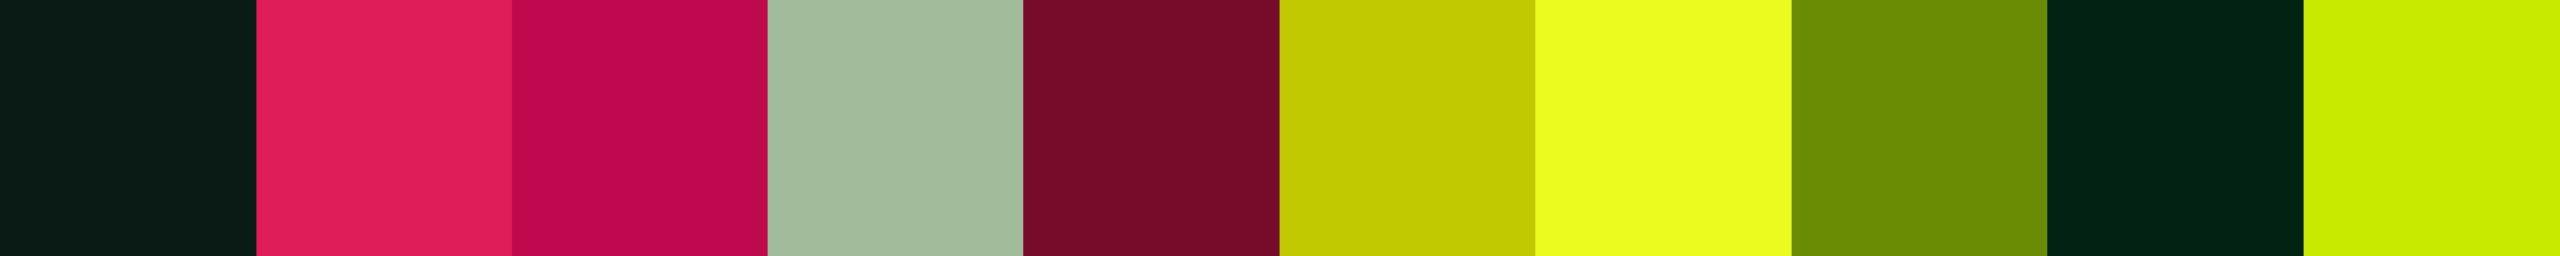 43 Deriana Color Palette